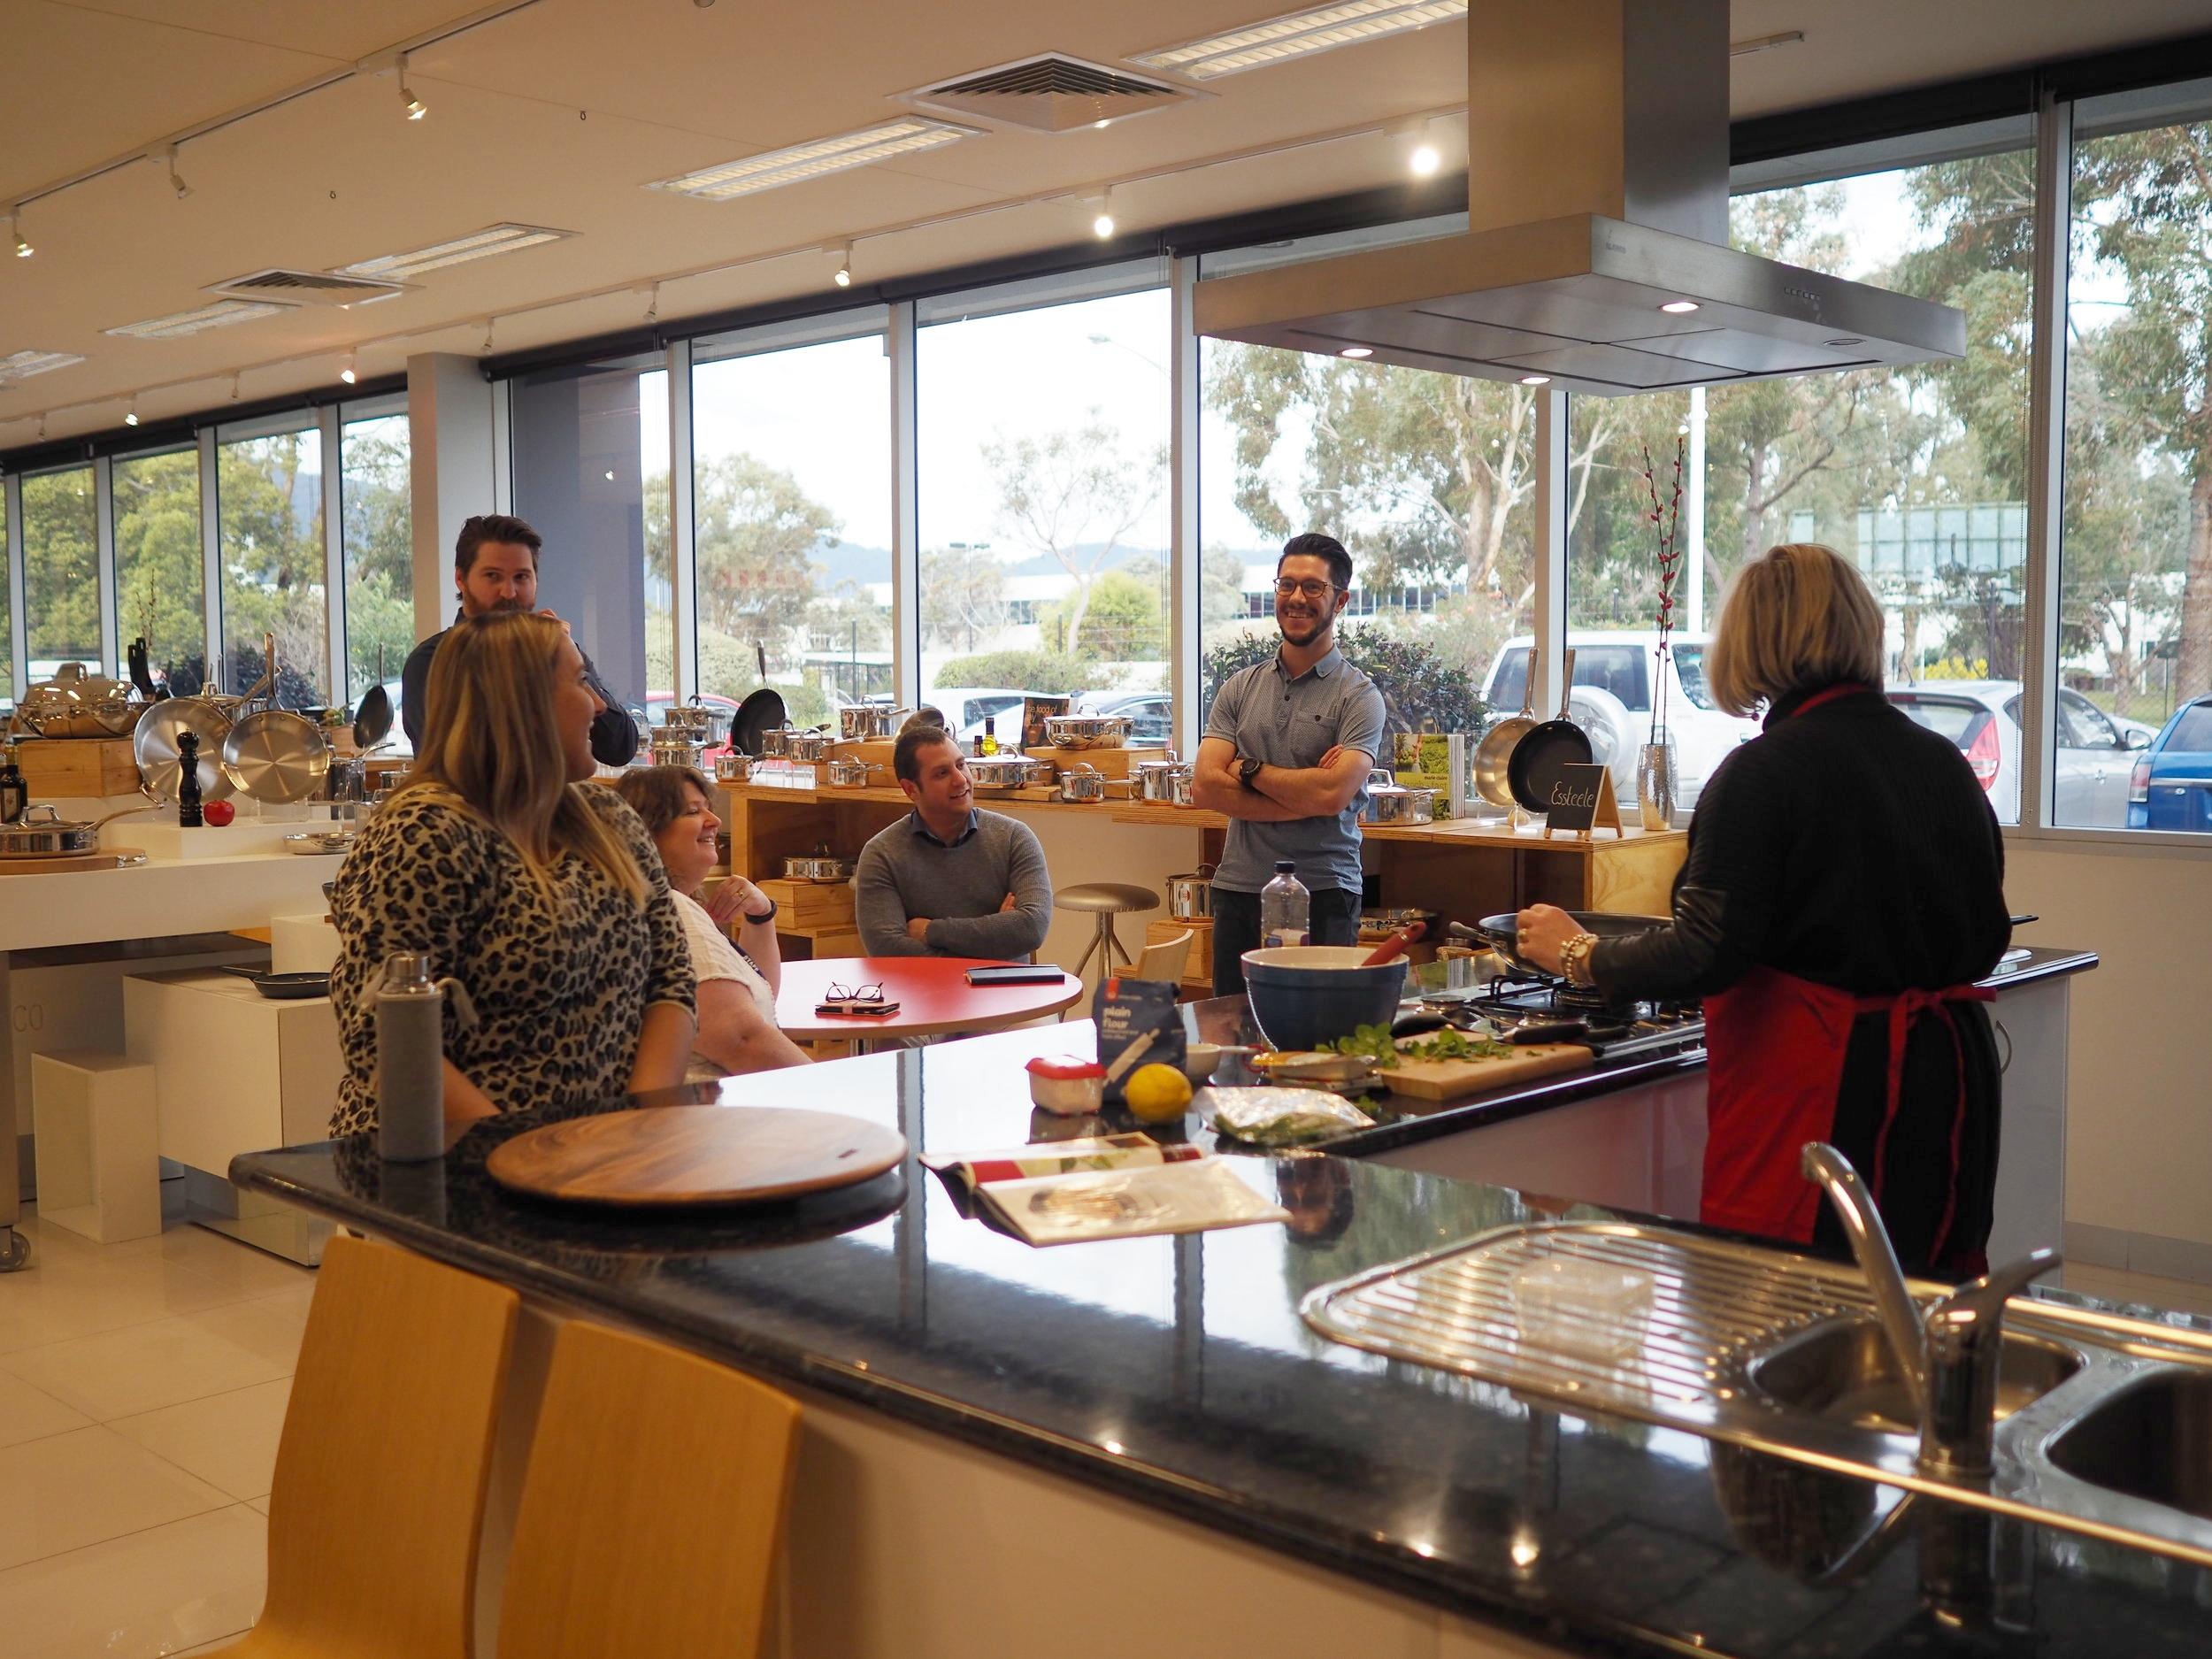 MEYER AUSTRALIA Showroom with kitchen area